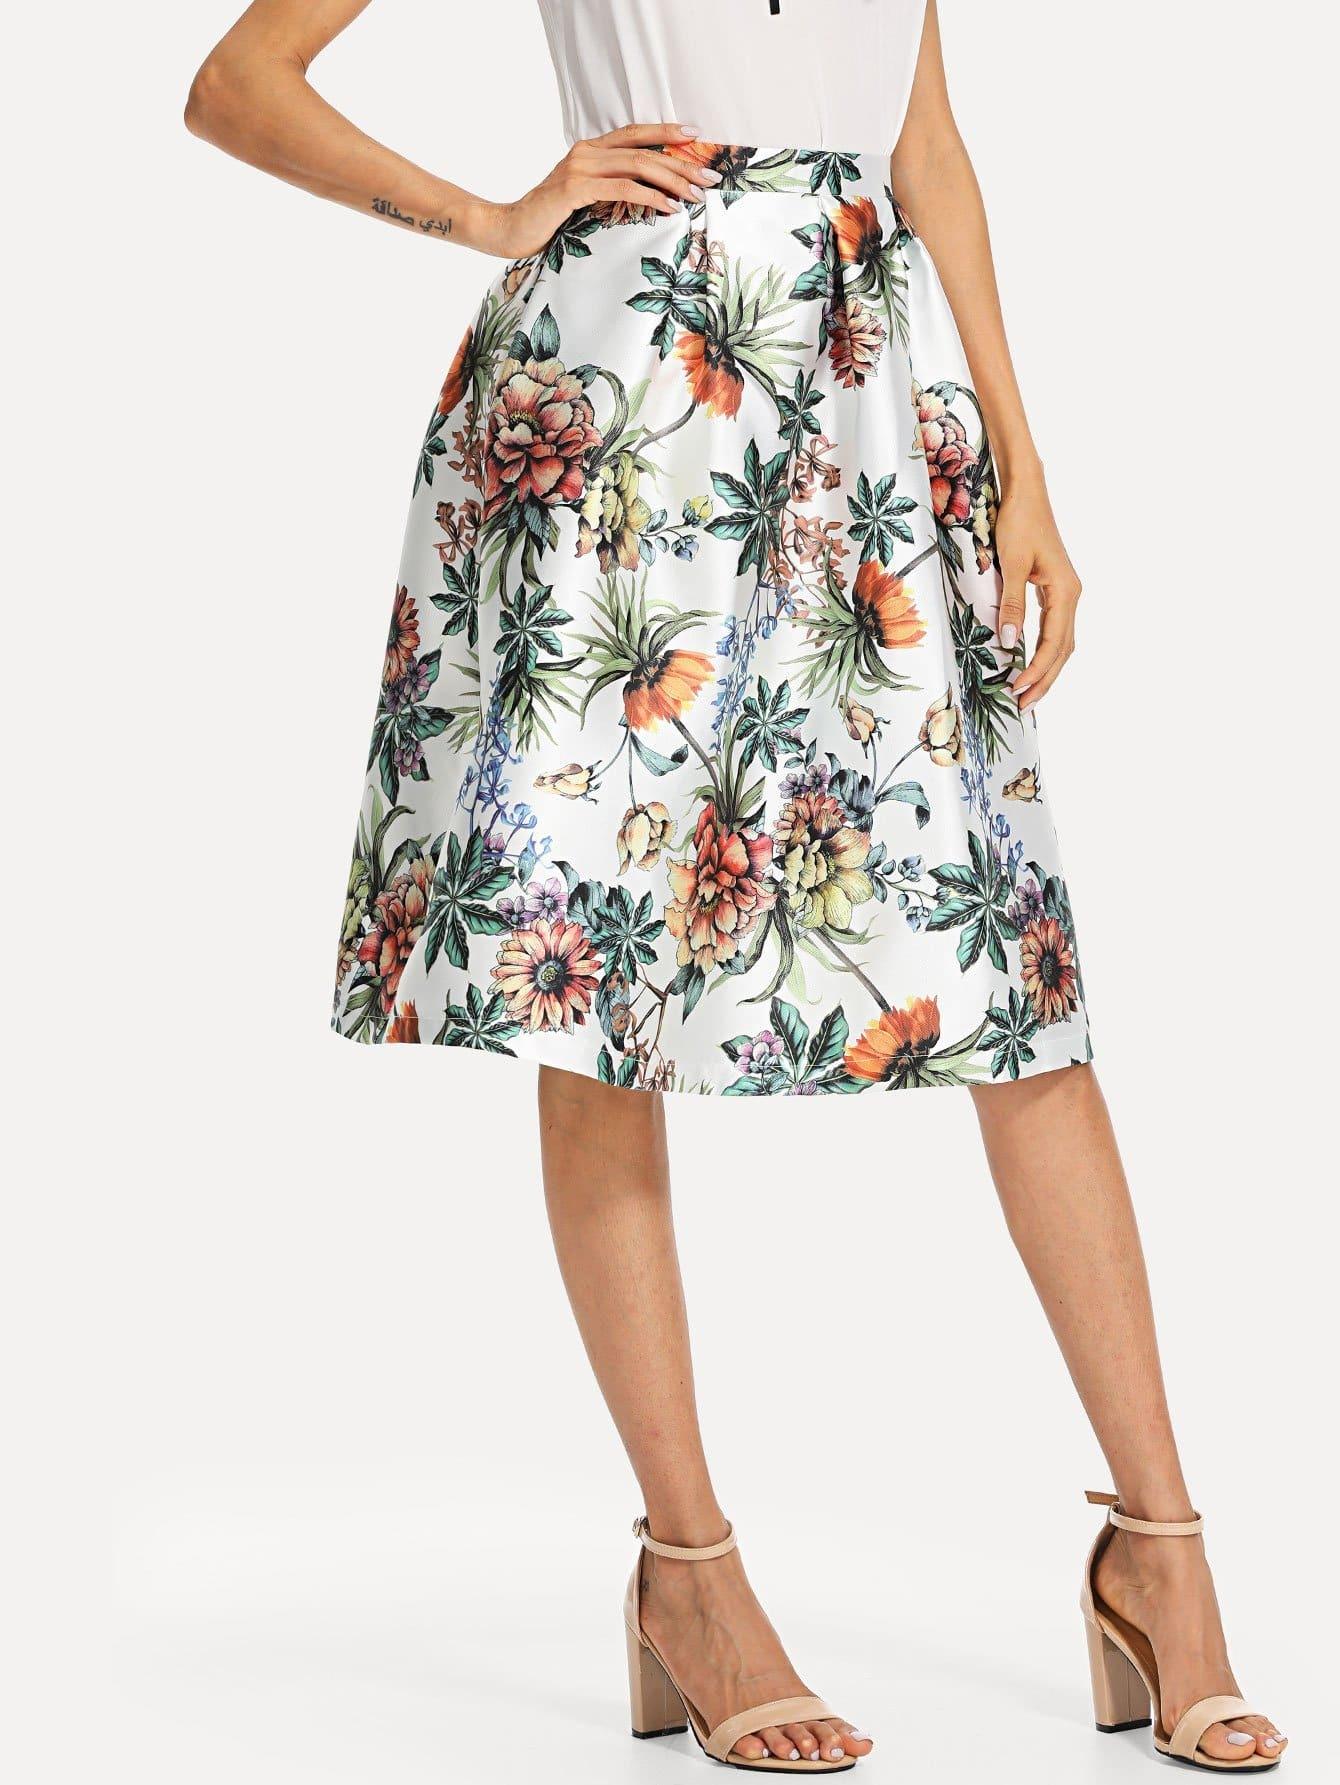 Flower Print Box Pleated Skirt flower print box pleated skirt